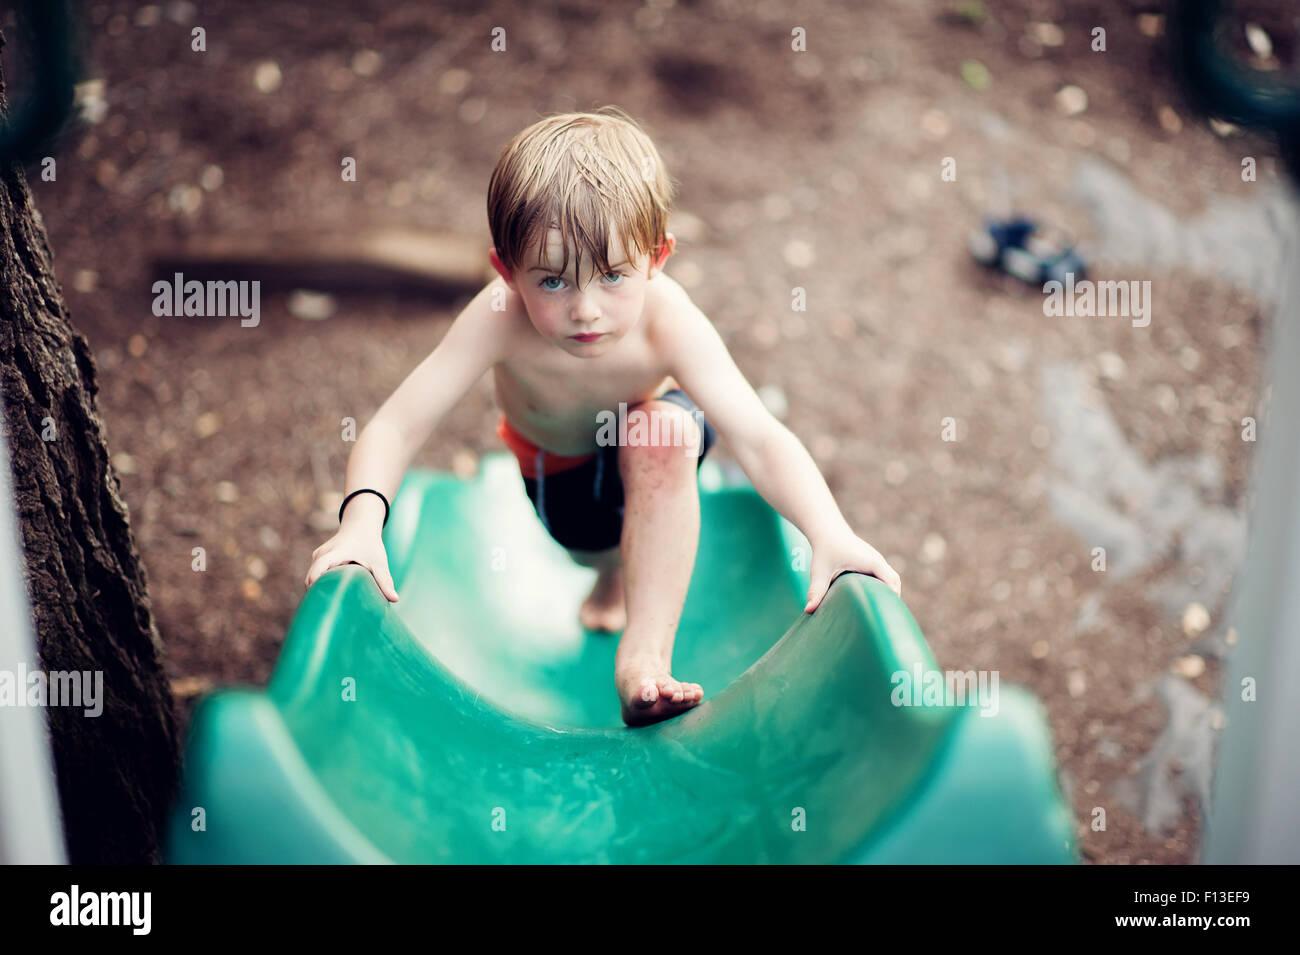 Garçon de monter une diapositive Photo Stock